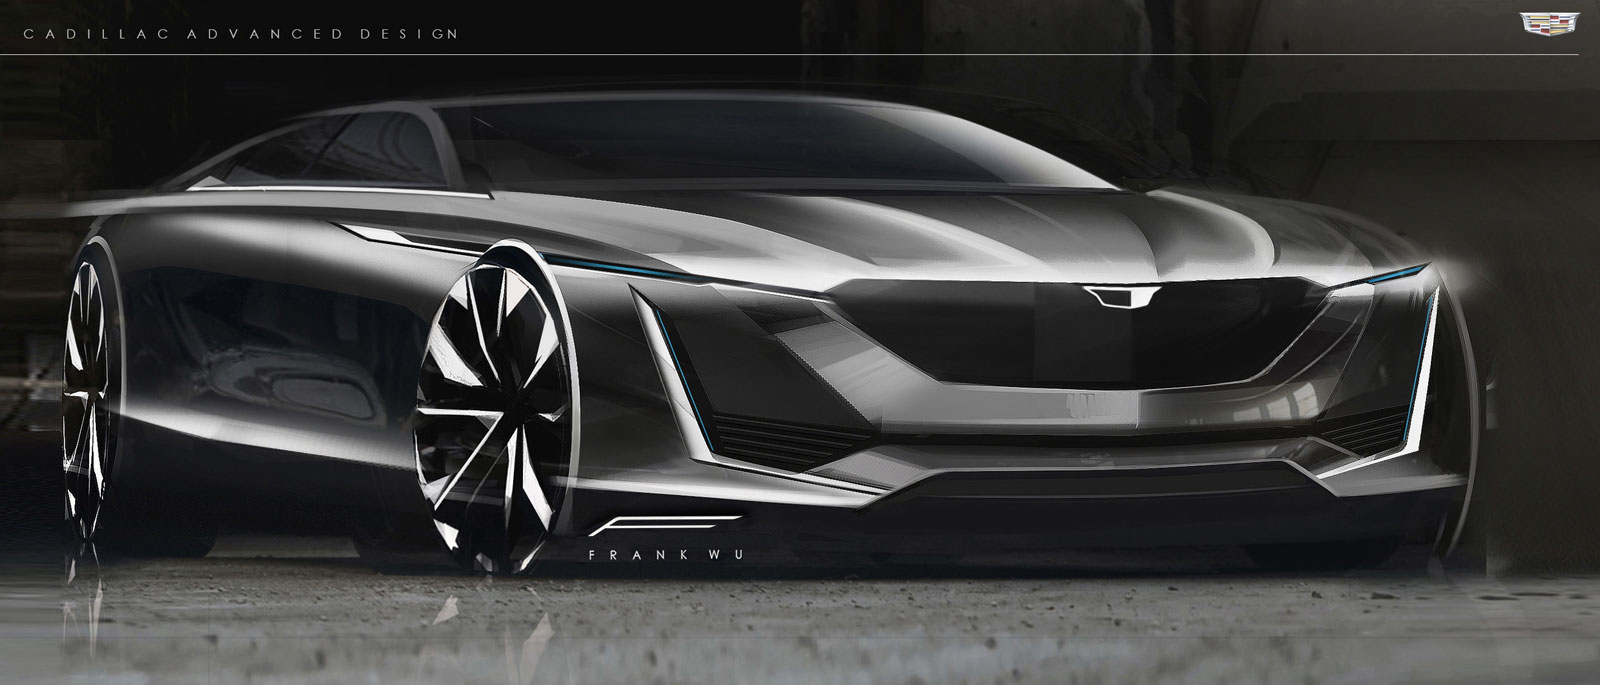 Cadillac concept cars 2016